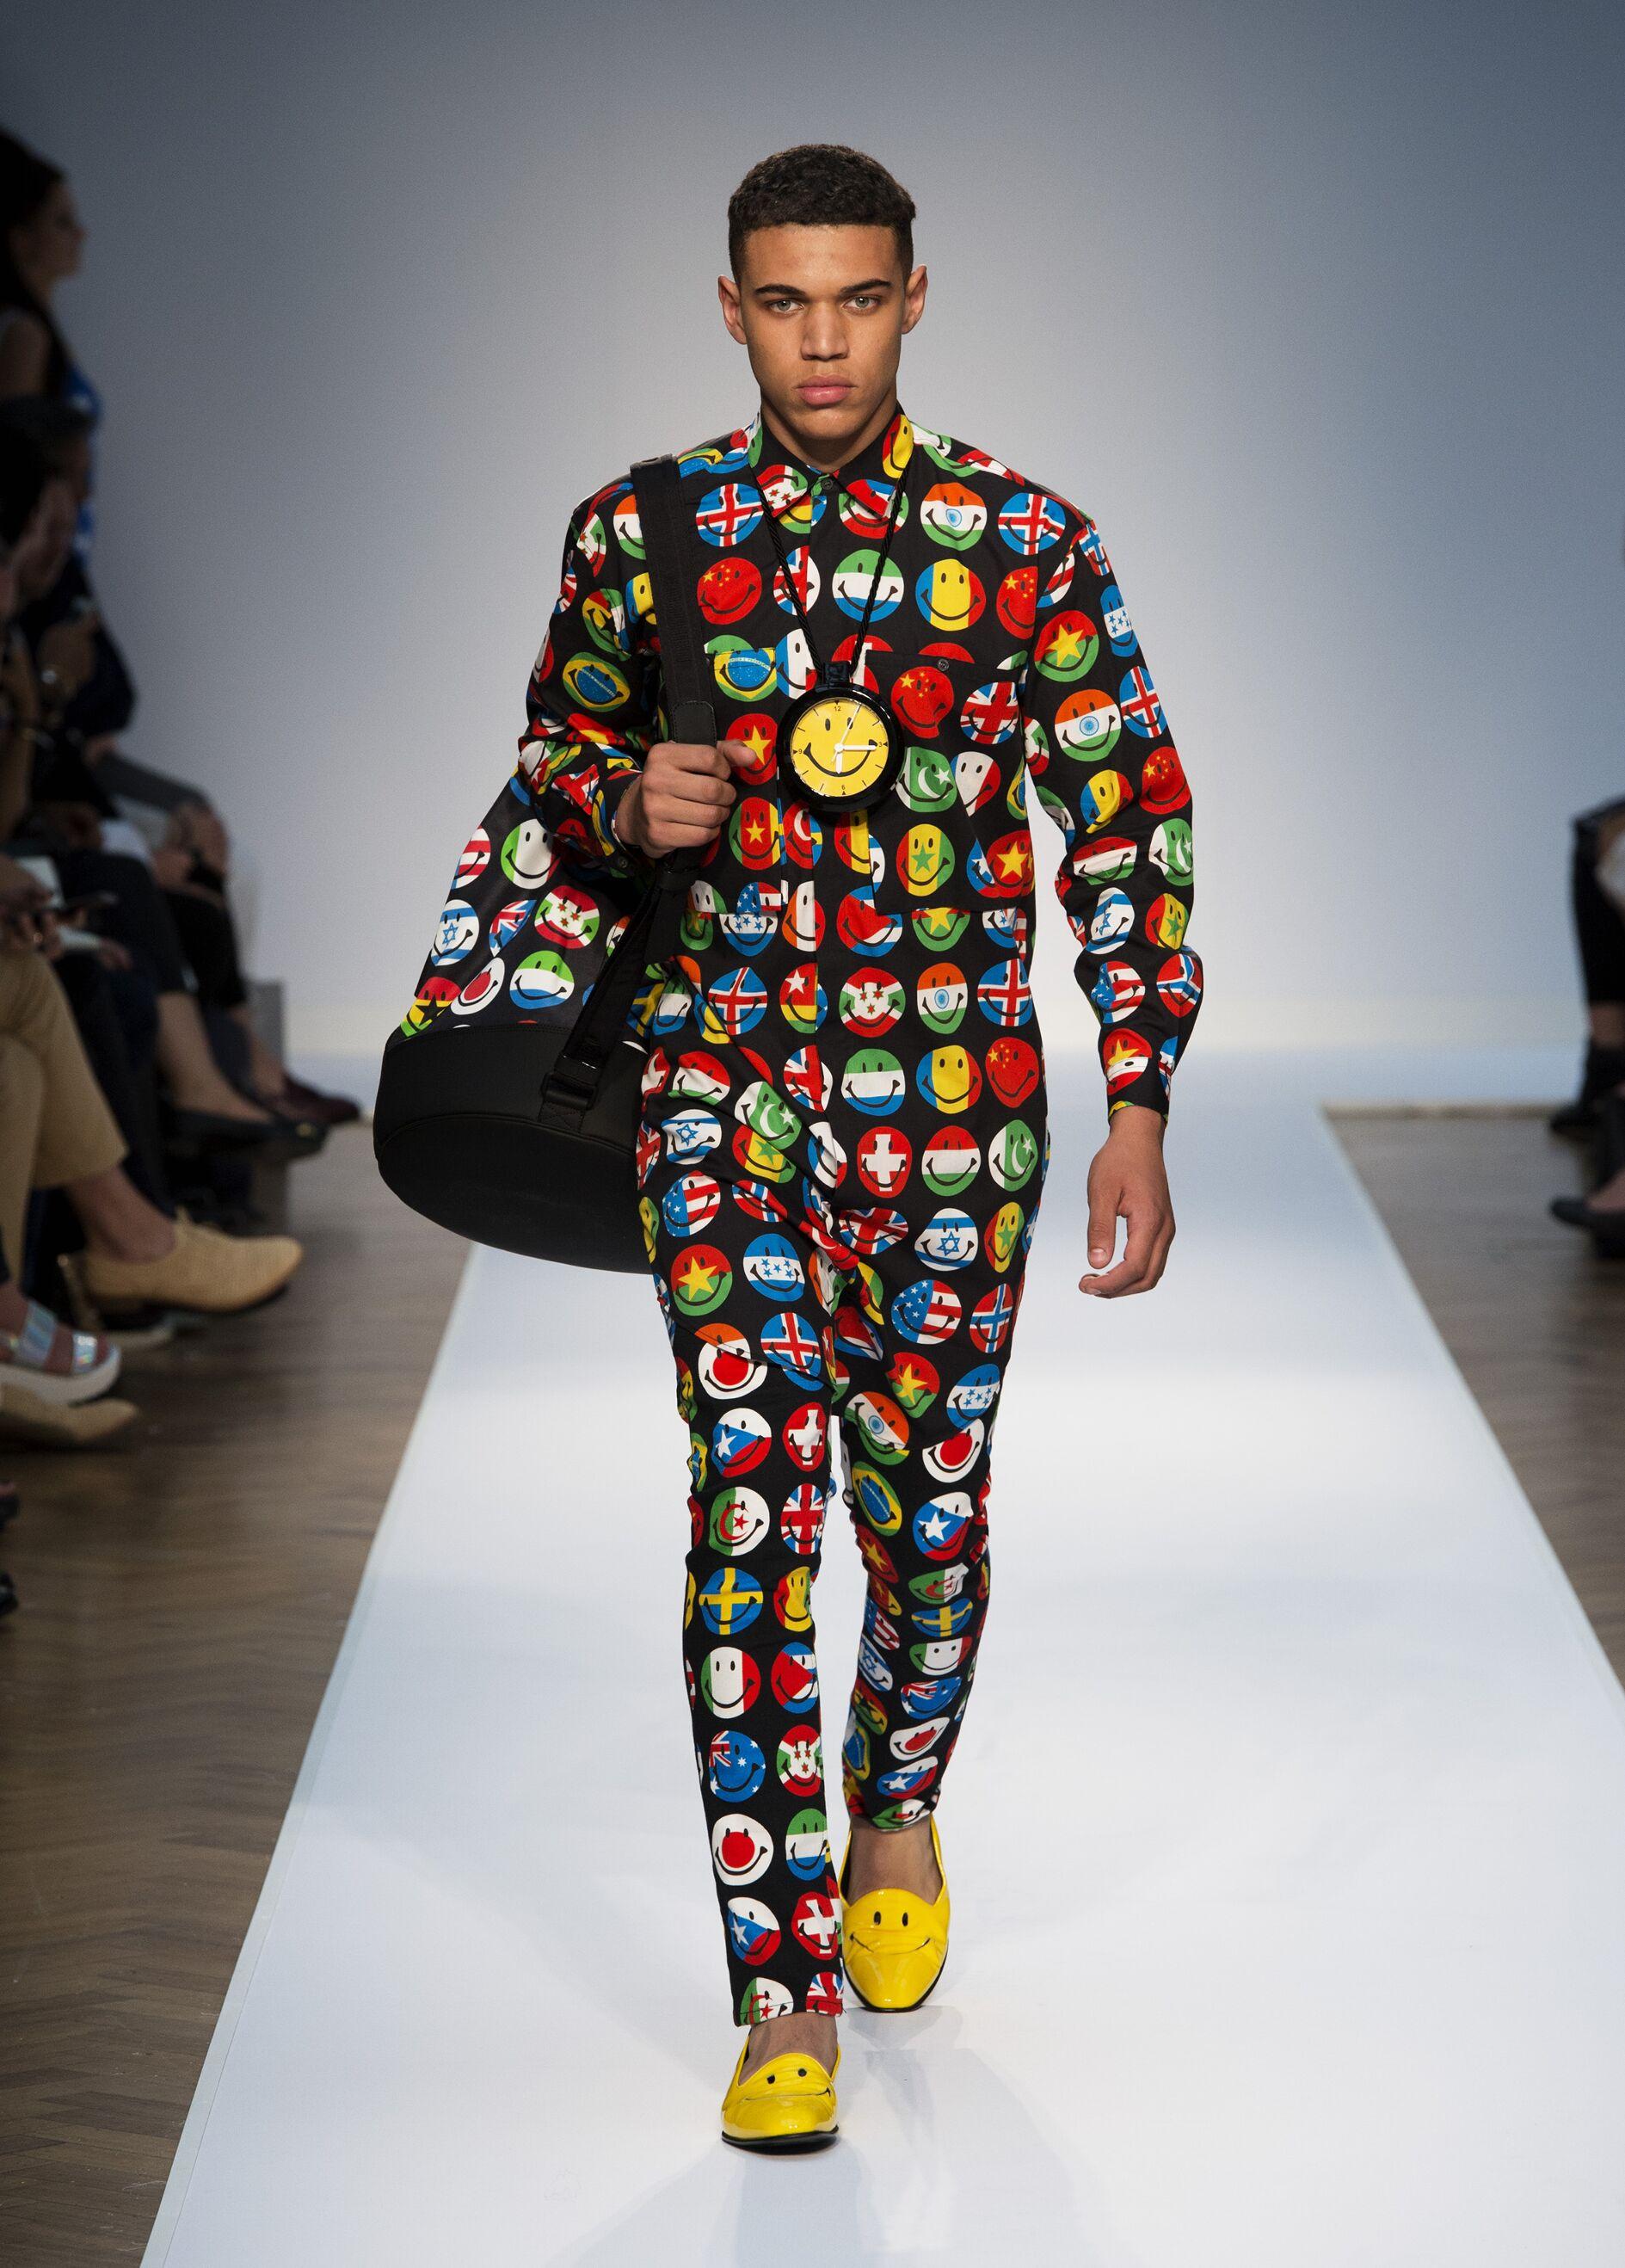 Fashion Model Moschino Catwalk